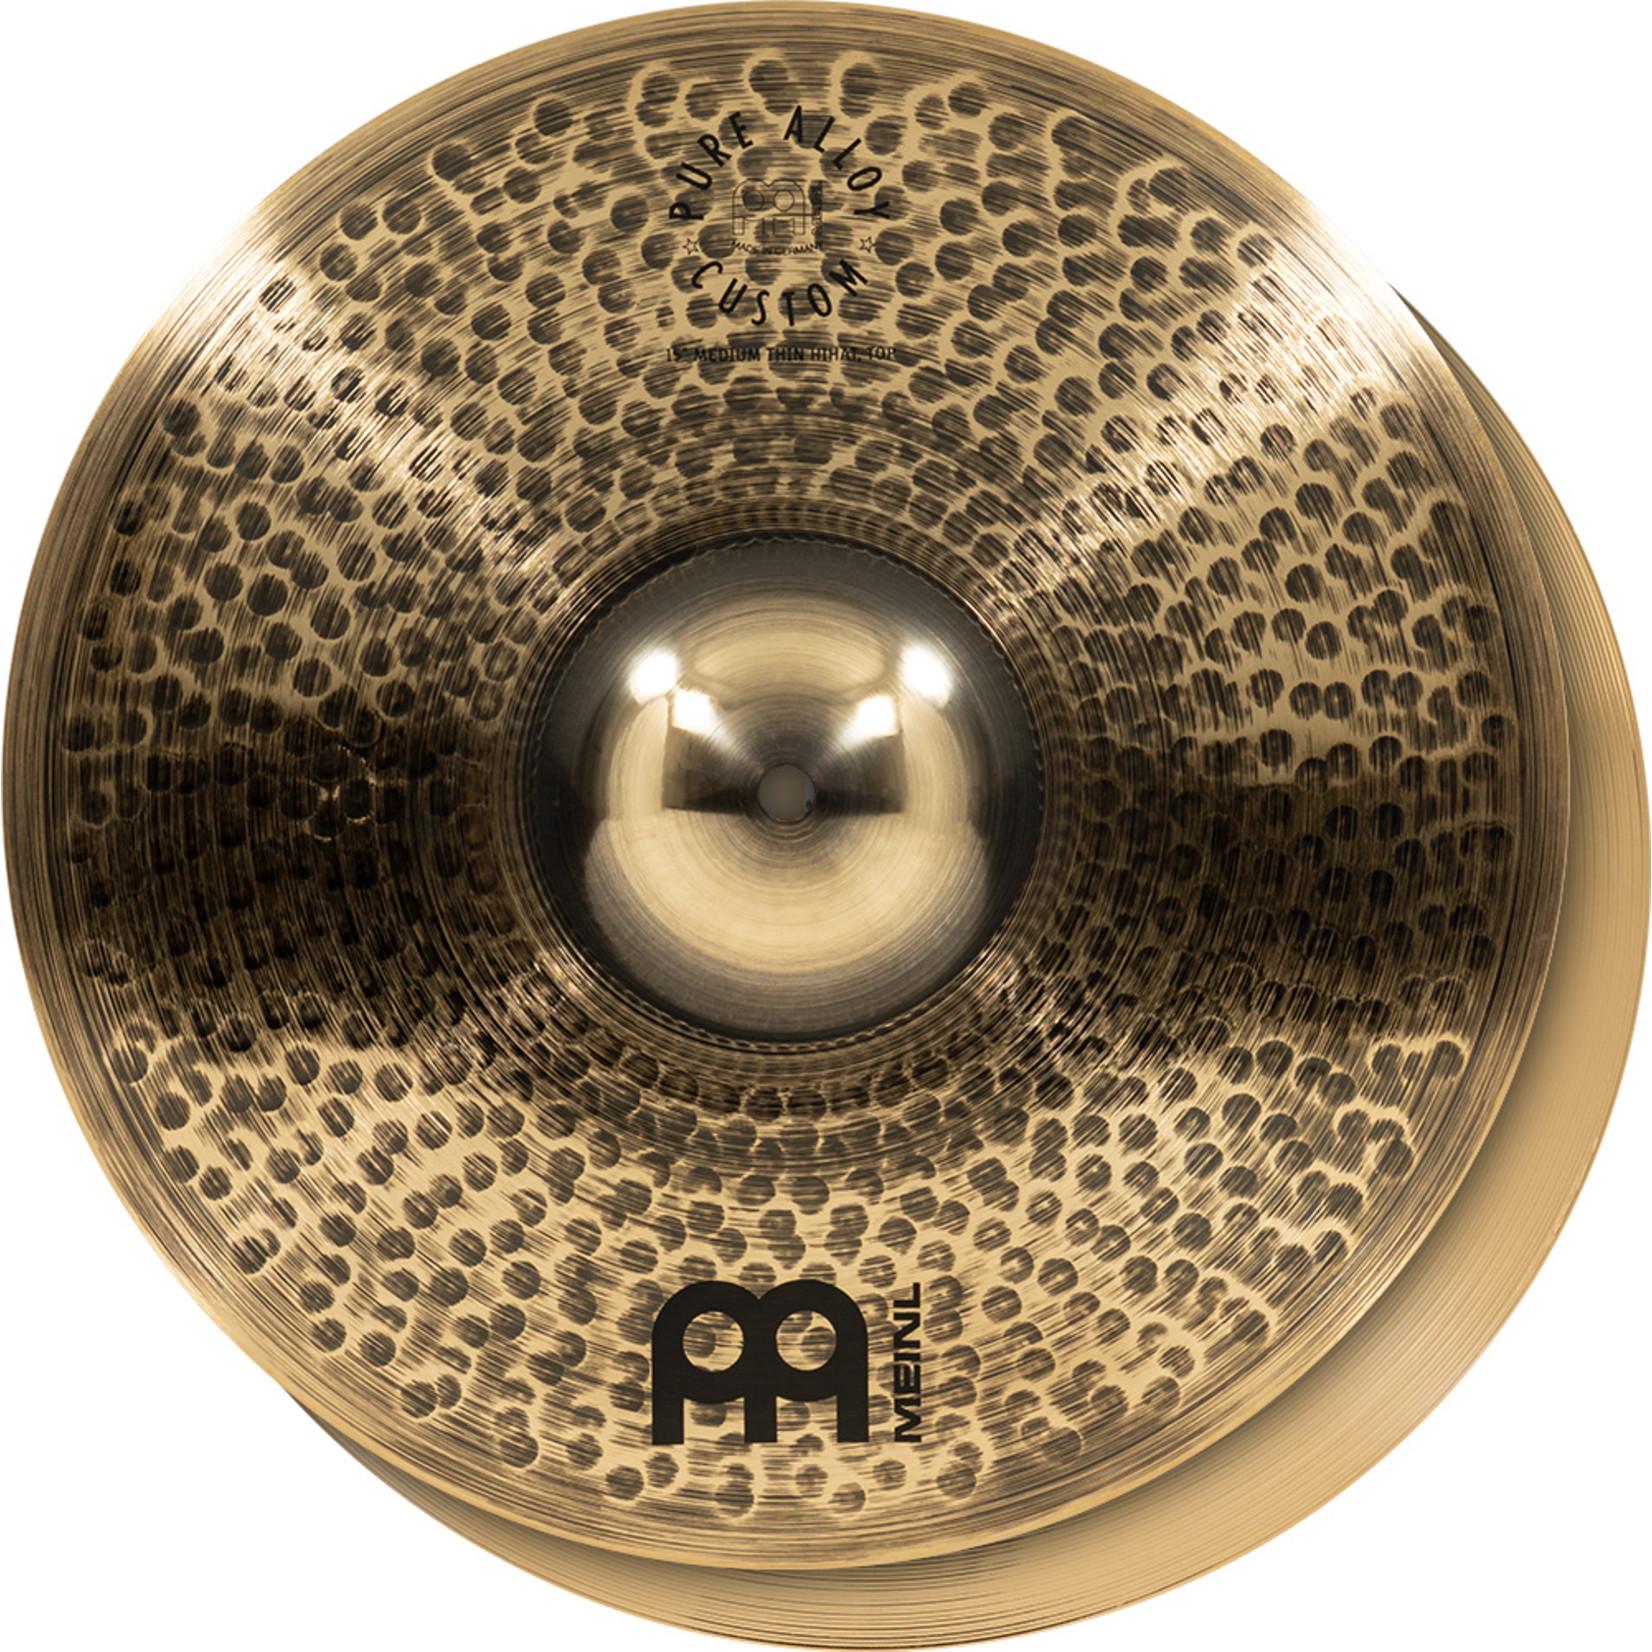 Meinl Meinl 15'' Pure Alloy Custom Medium Thin Hihat, pair